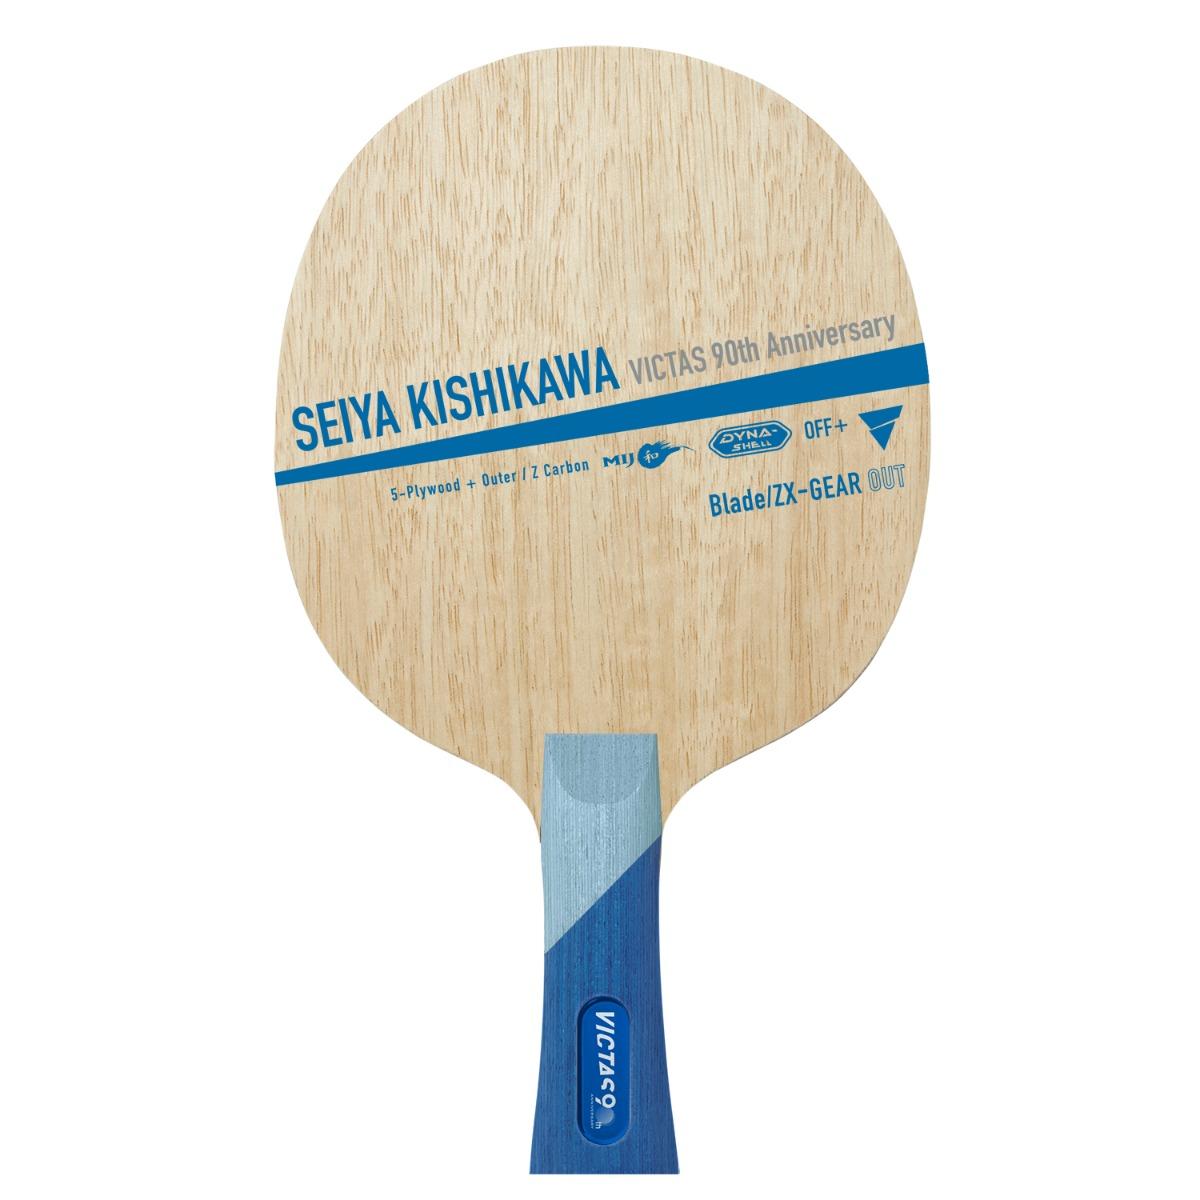 VICTAS 卓球 ラバー ラケット Rubber Racket ボール Ball 新商品 ギア商品情報特設ページ